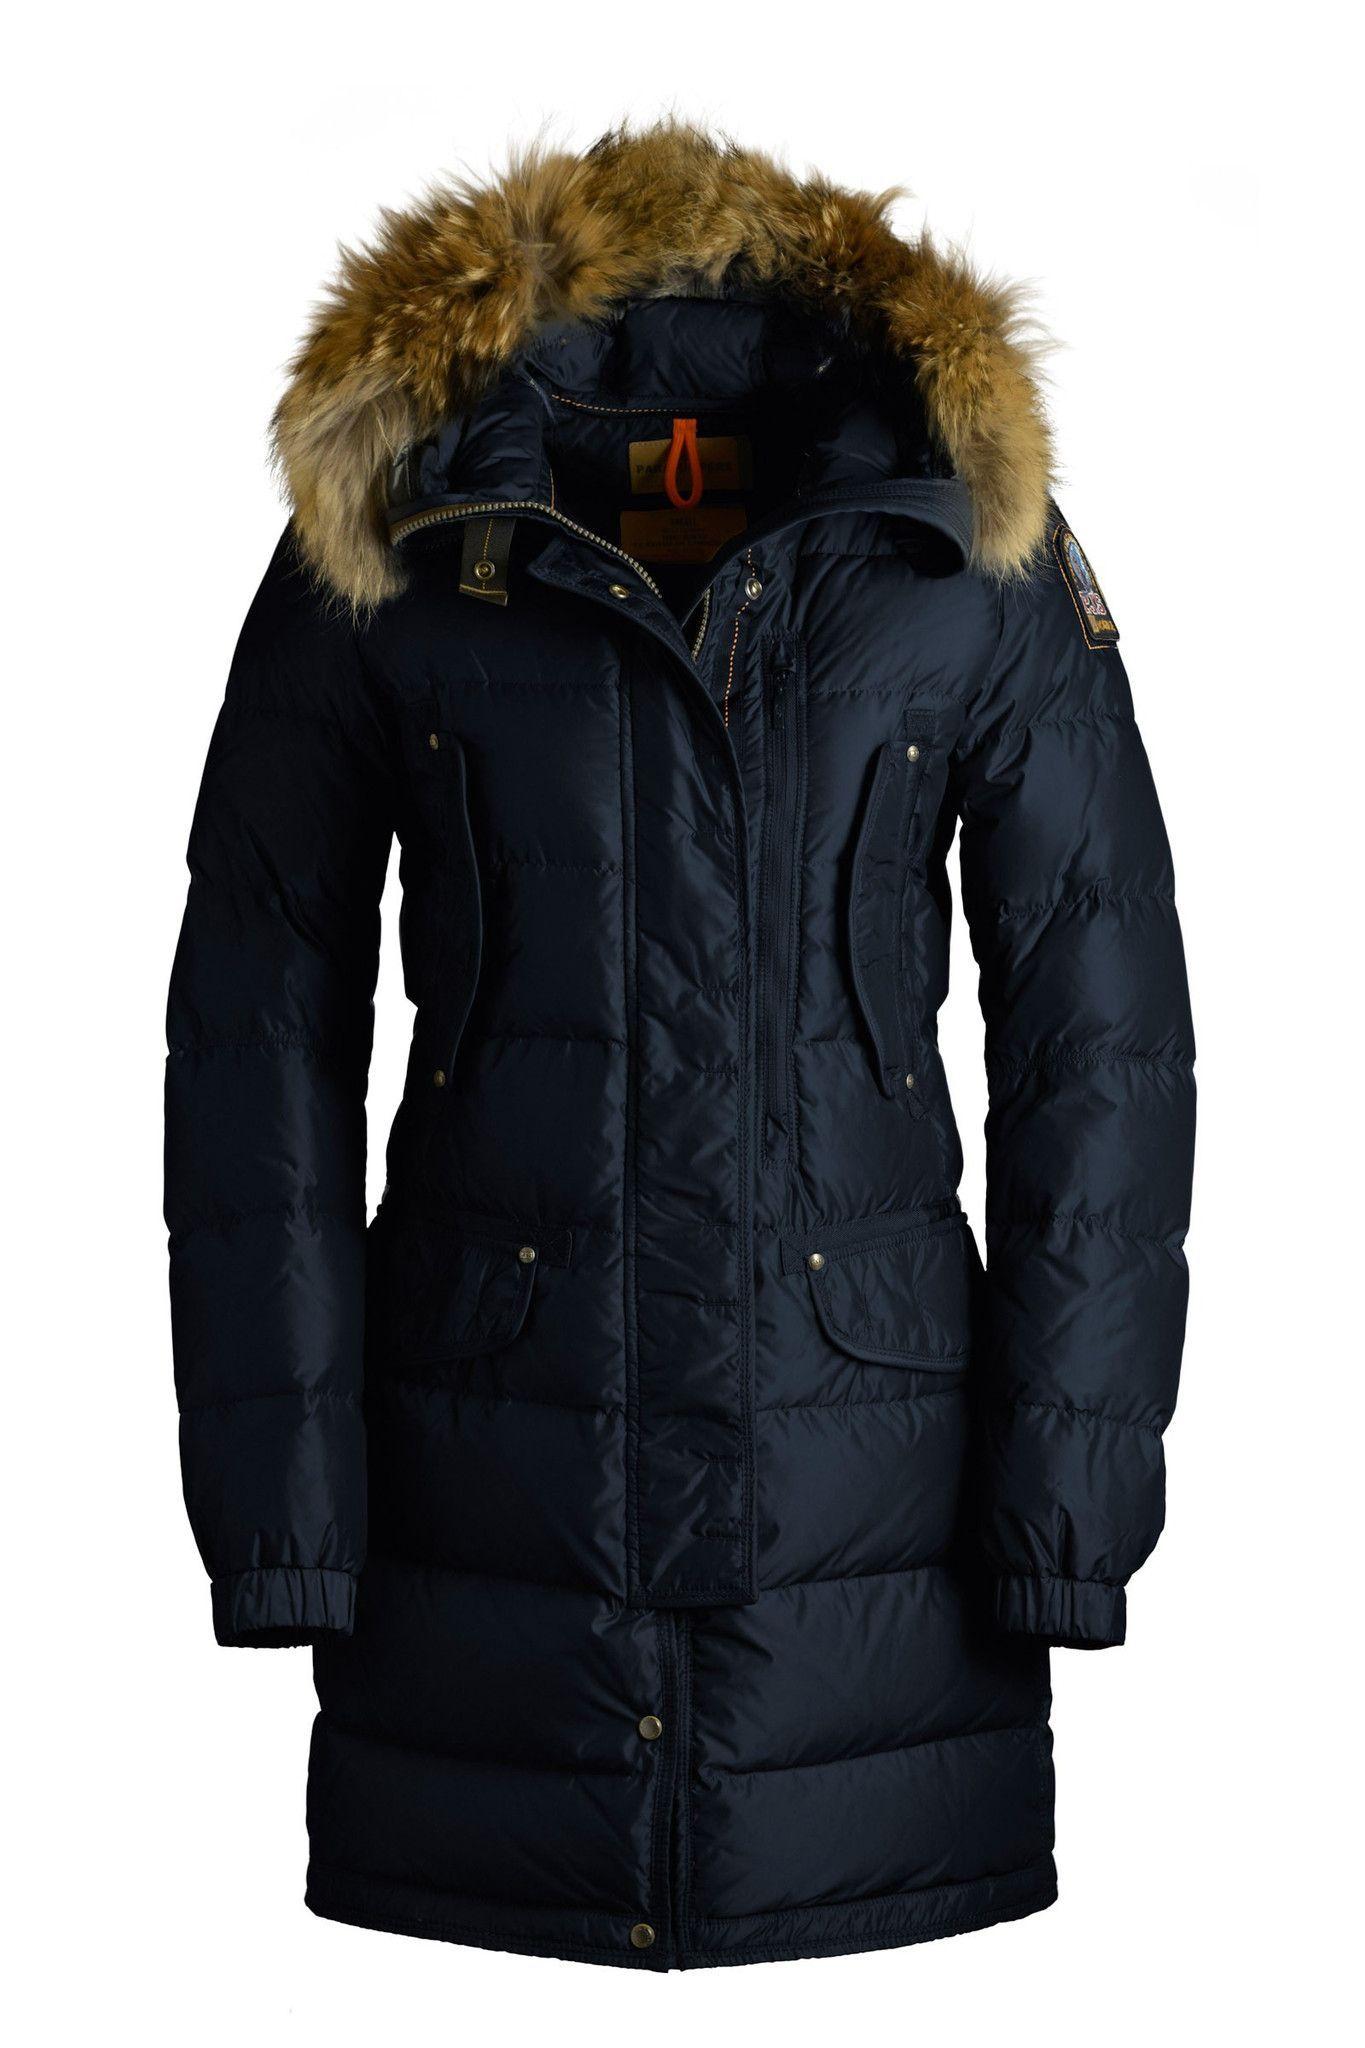 Parajumpers - Navy Down Mountain Loft Ski Master Jacket | MEN'S STYLE | Pinterest